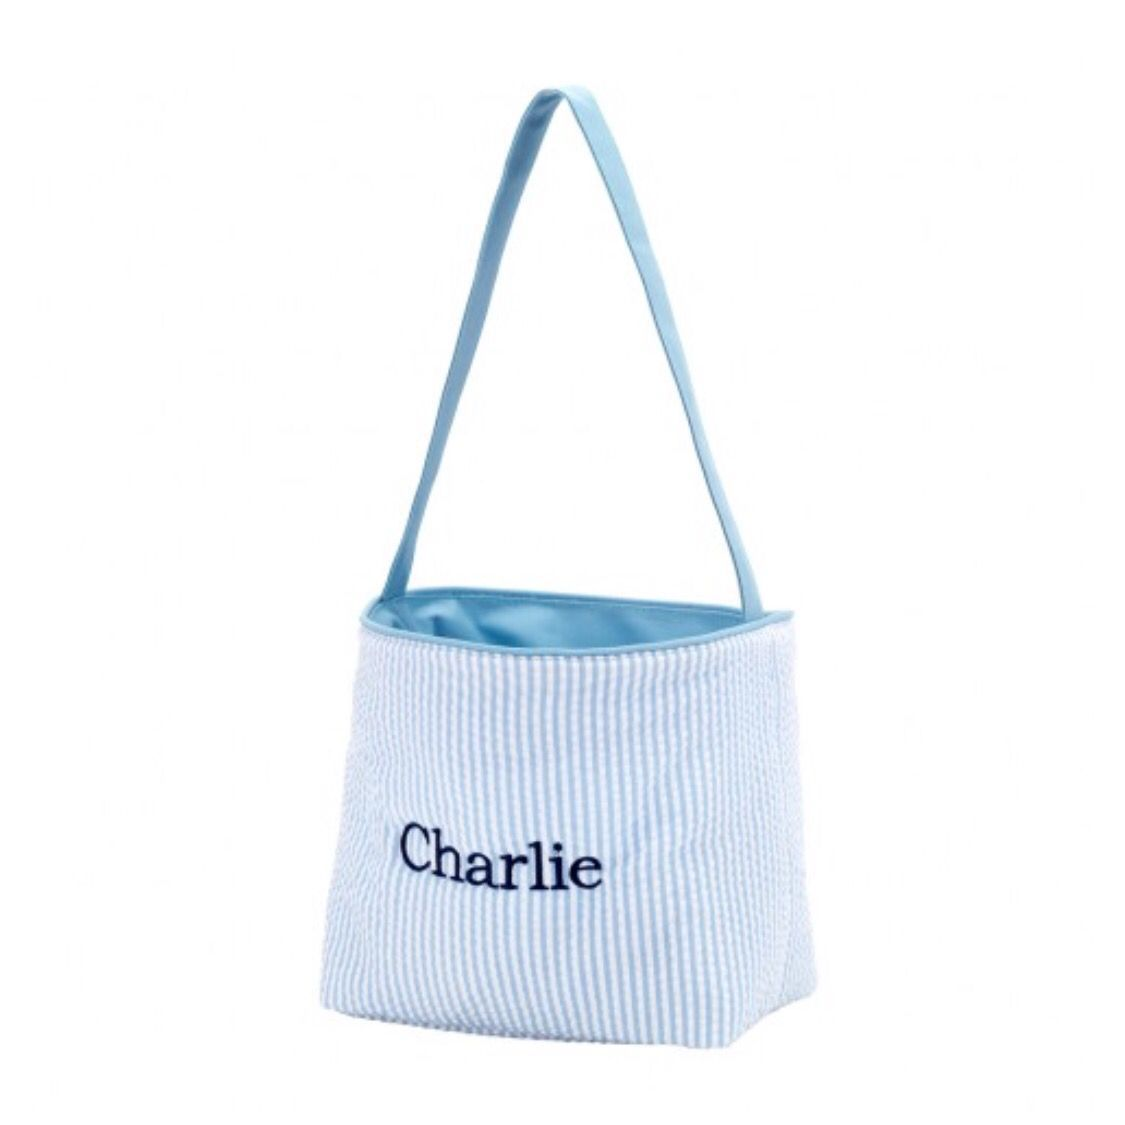 Wholesale boutique easter basket blue seersucker seersucker and wholesale boutique easter basket blue seersucker negle Images